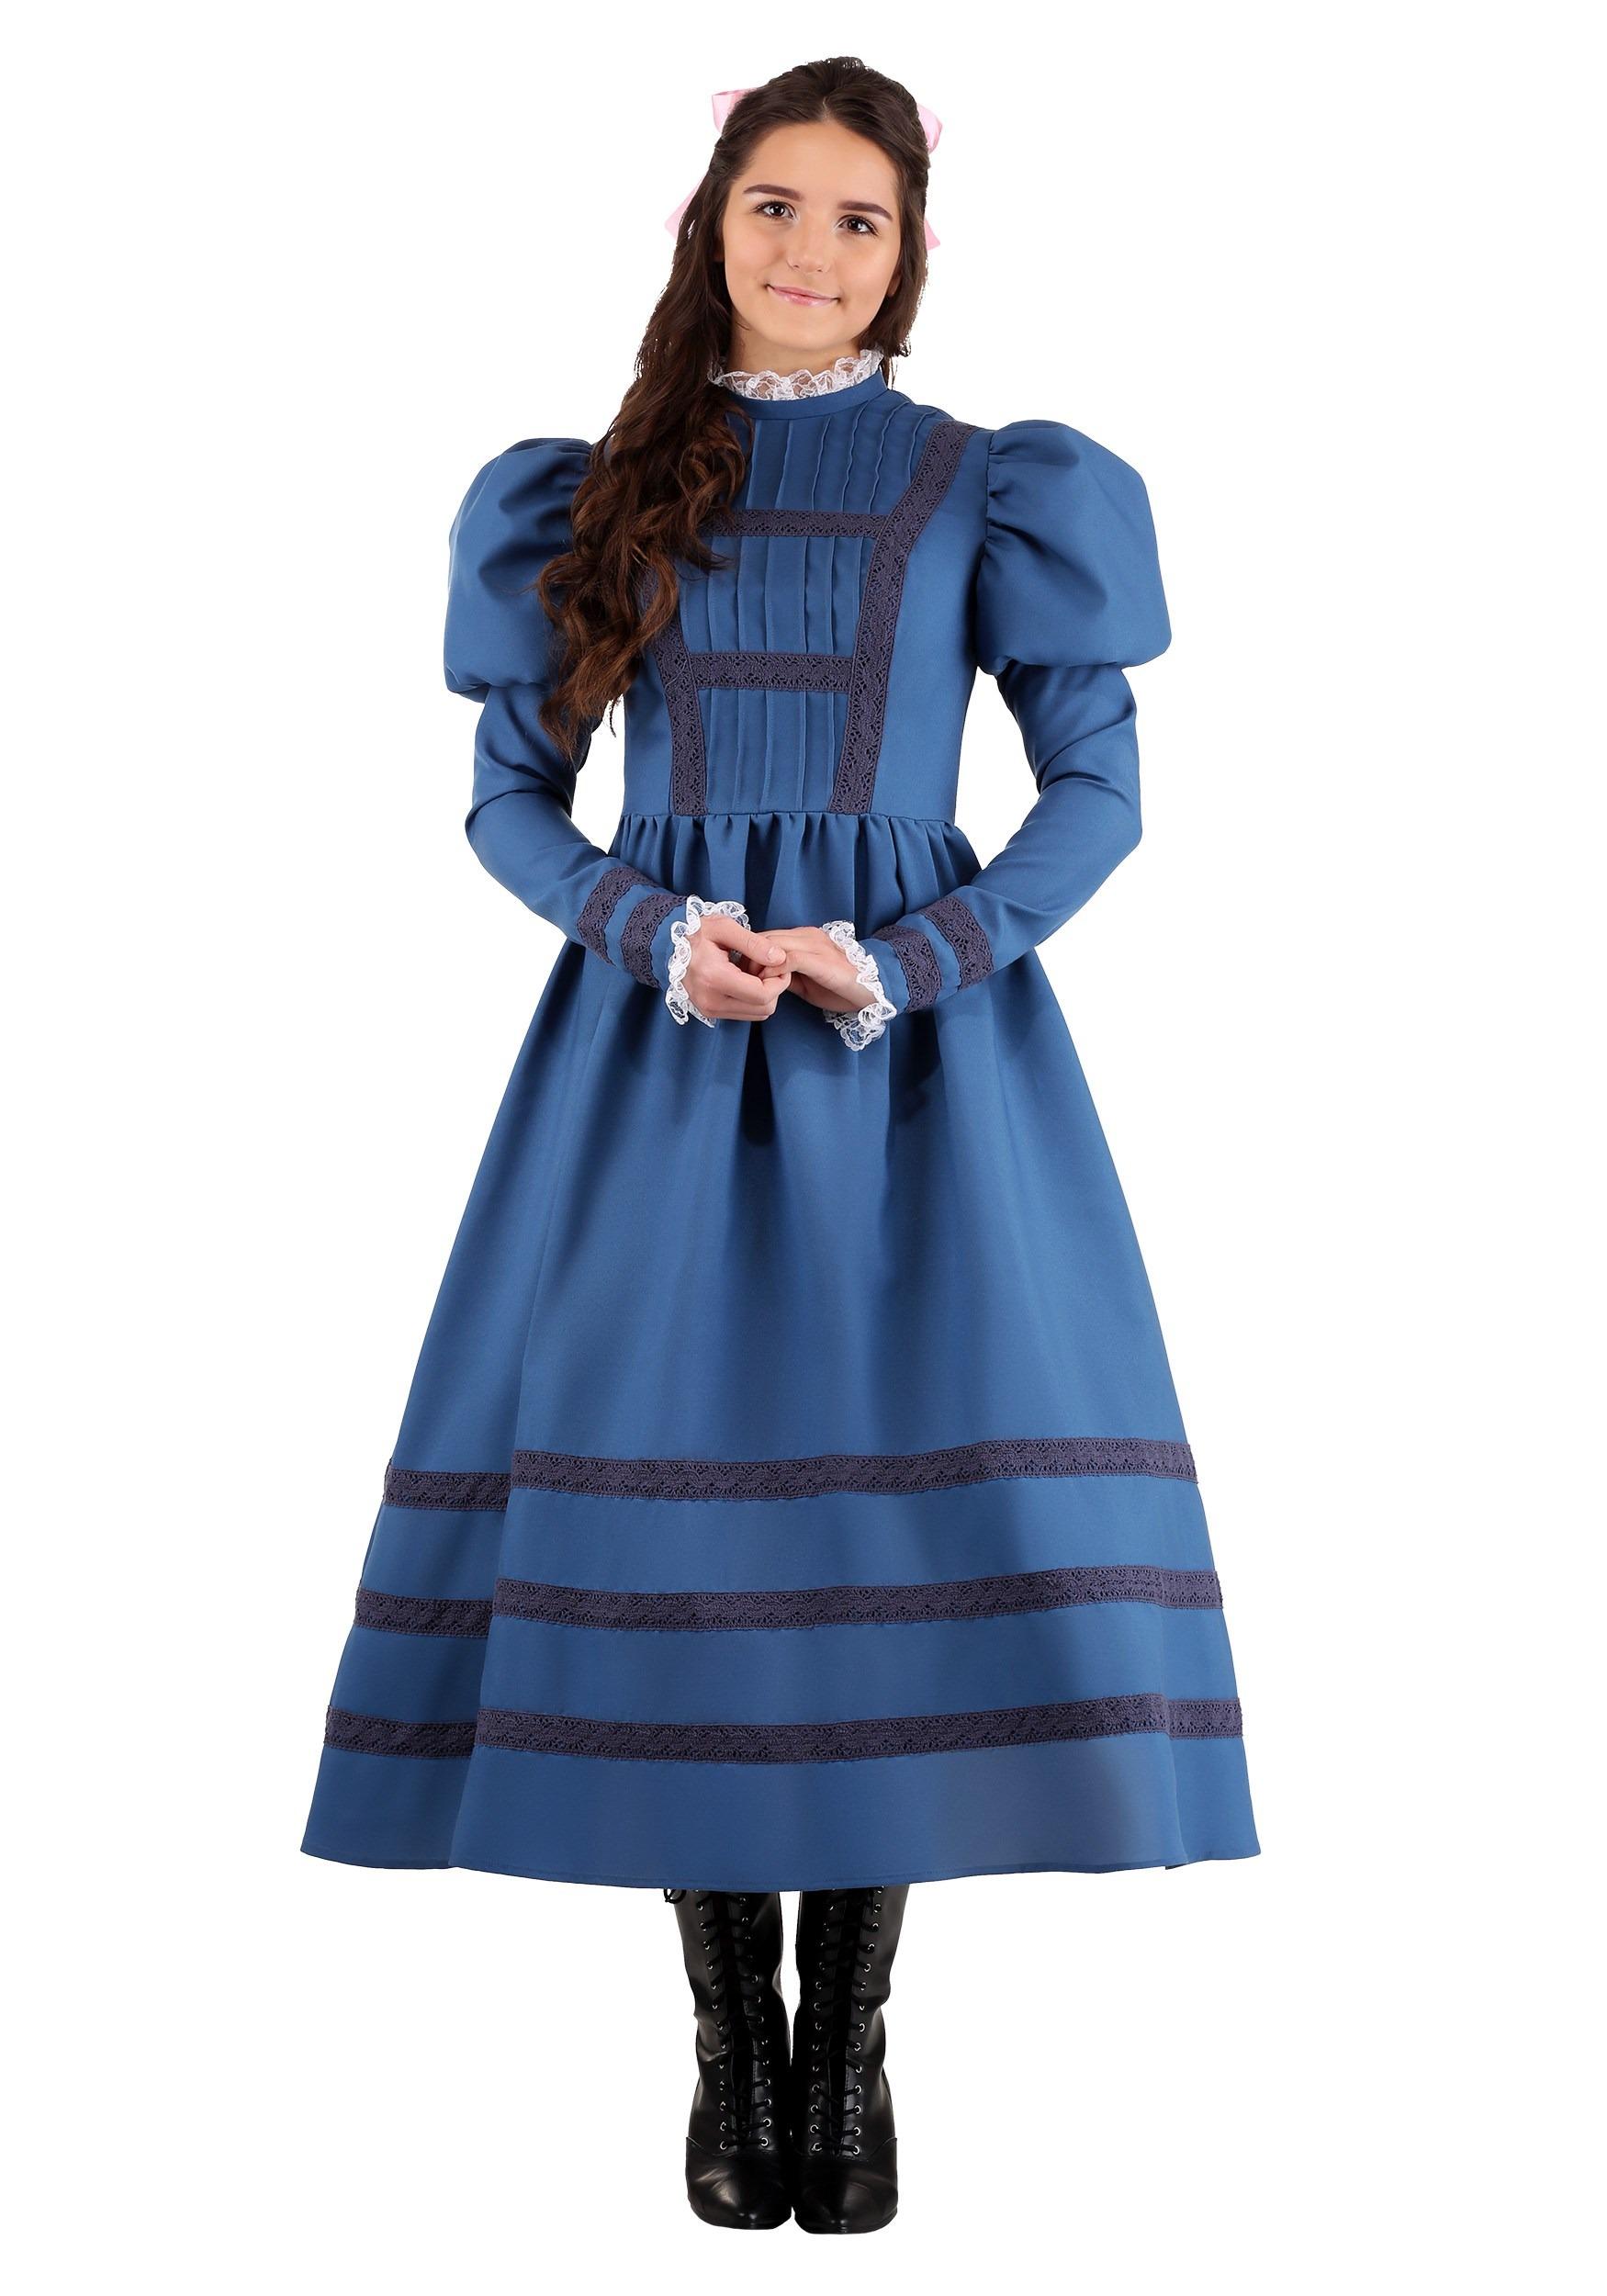 Helen Keller Women S Costume